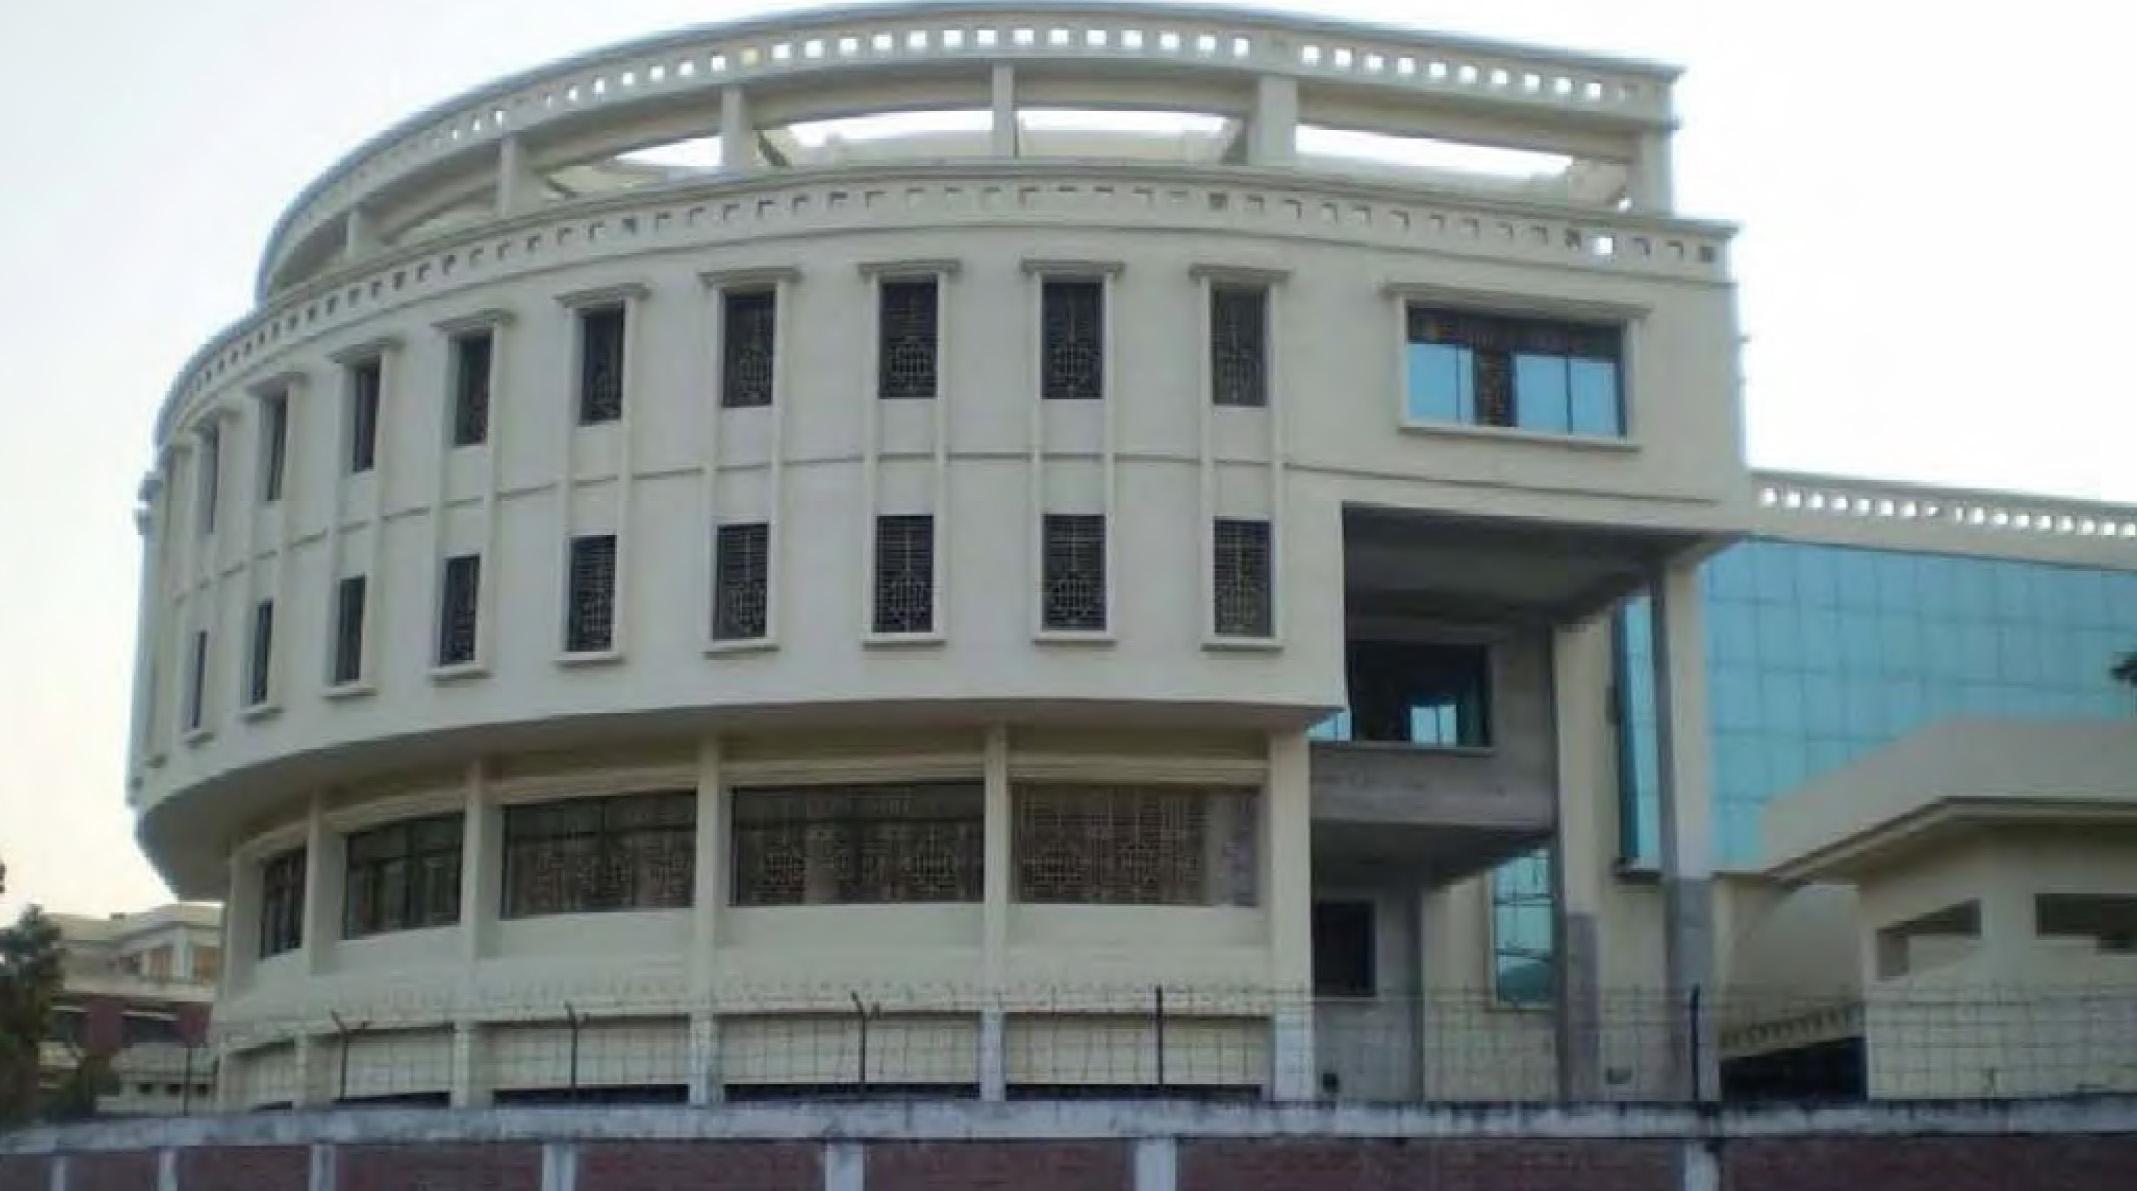 bANGlADESH bANK bUIlDING IN RANGPUR